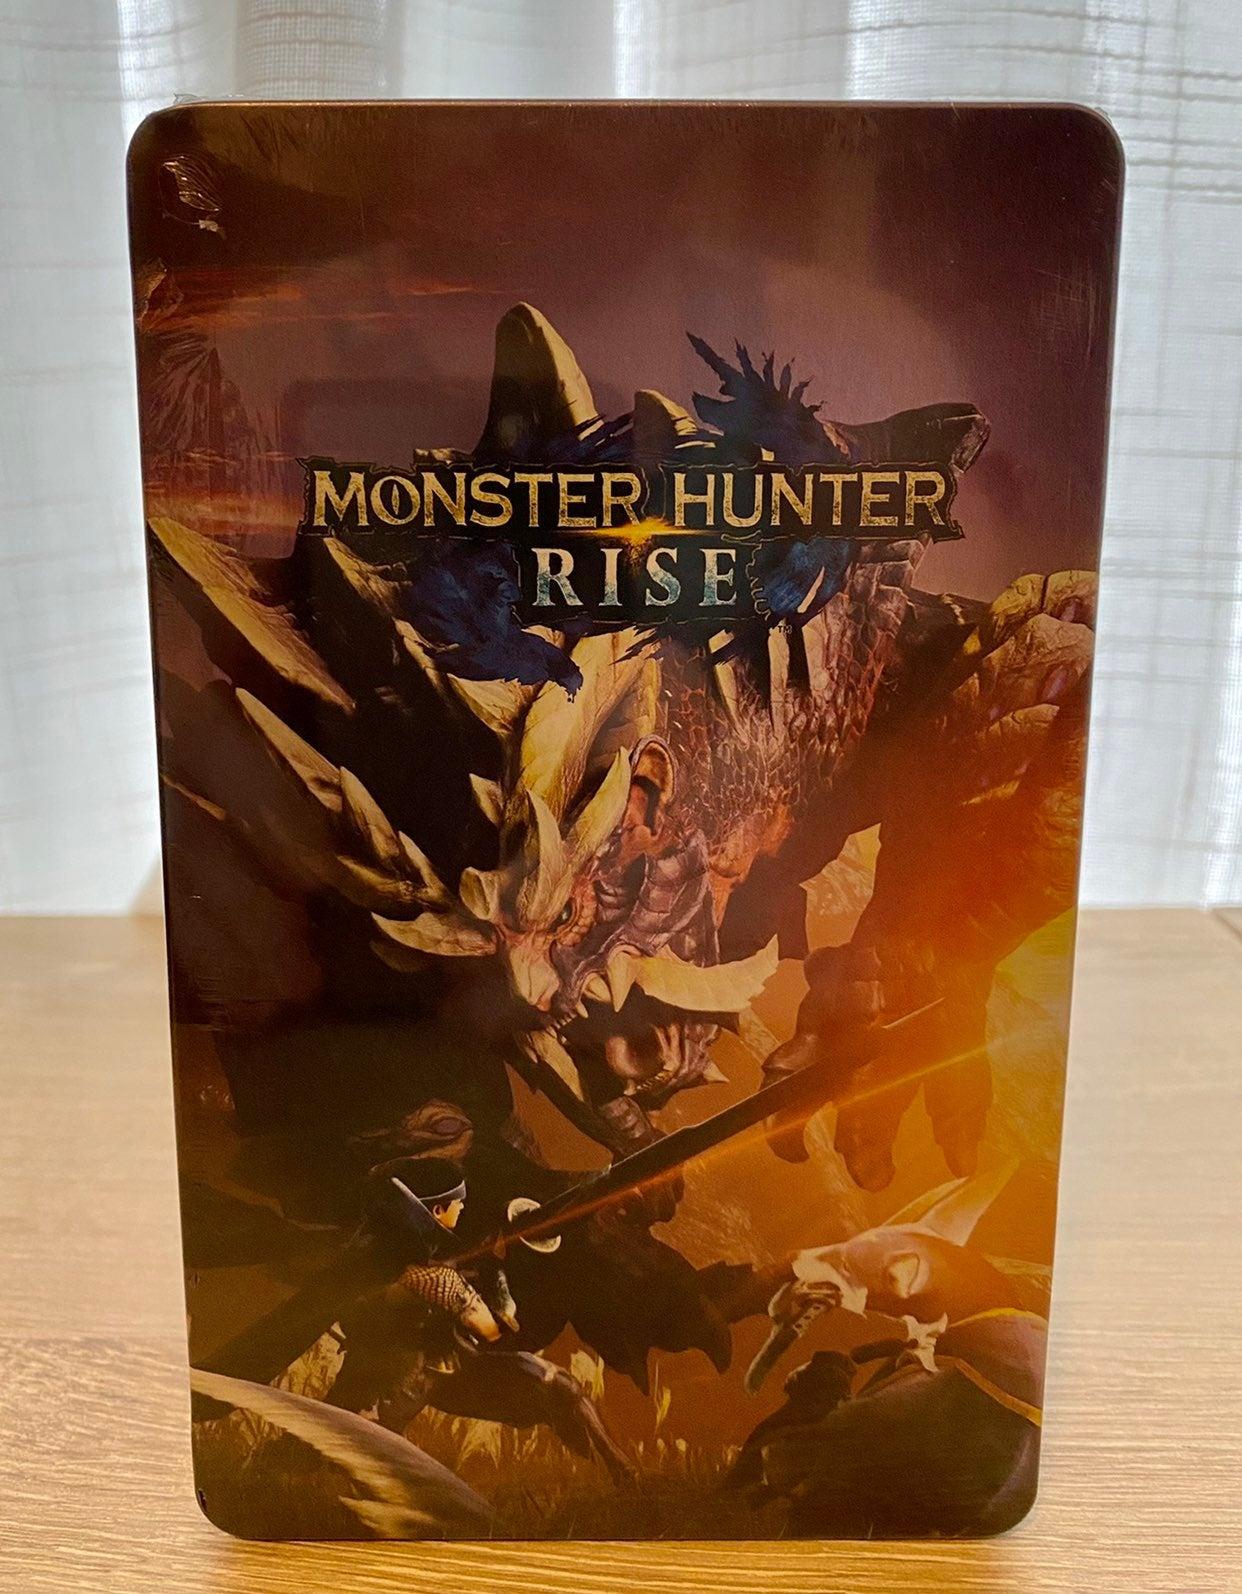 Monster Hunter Rise Steelbook Case